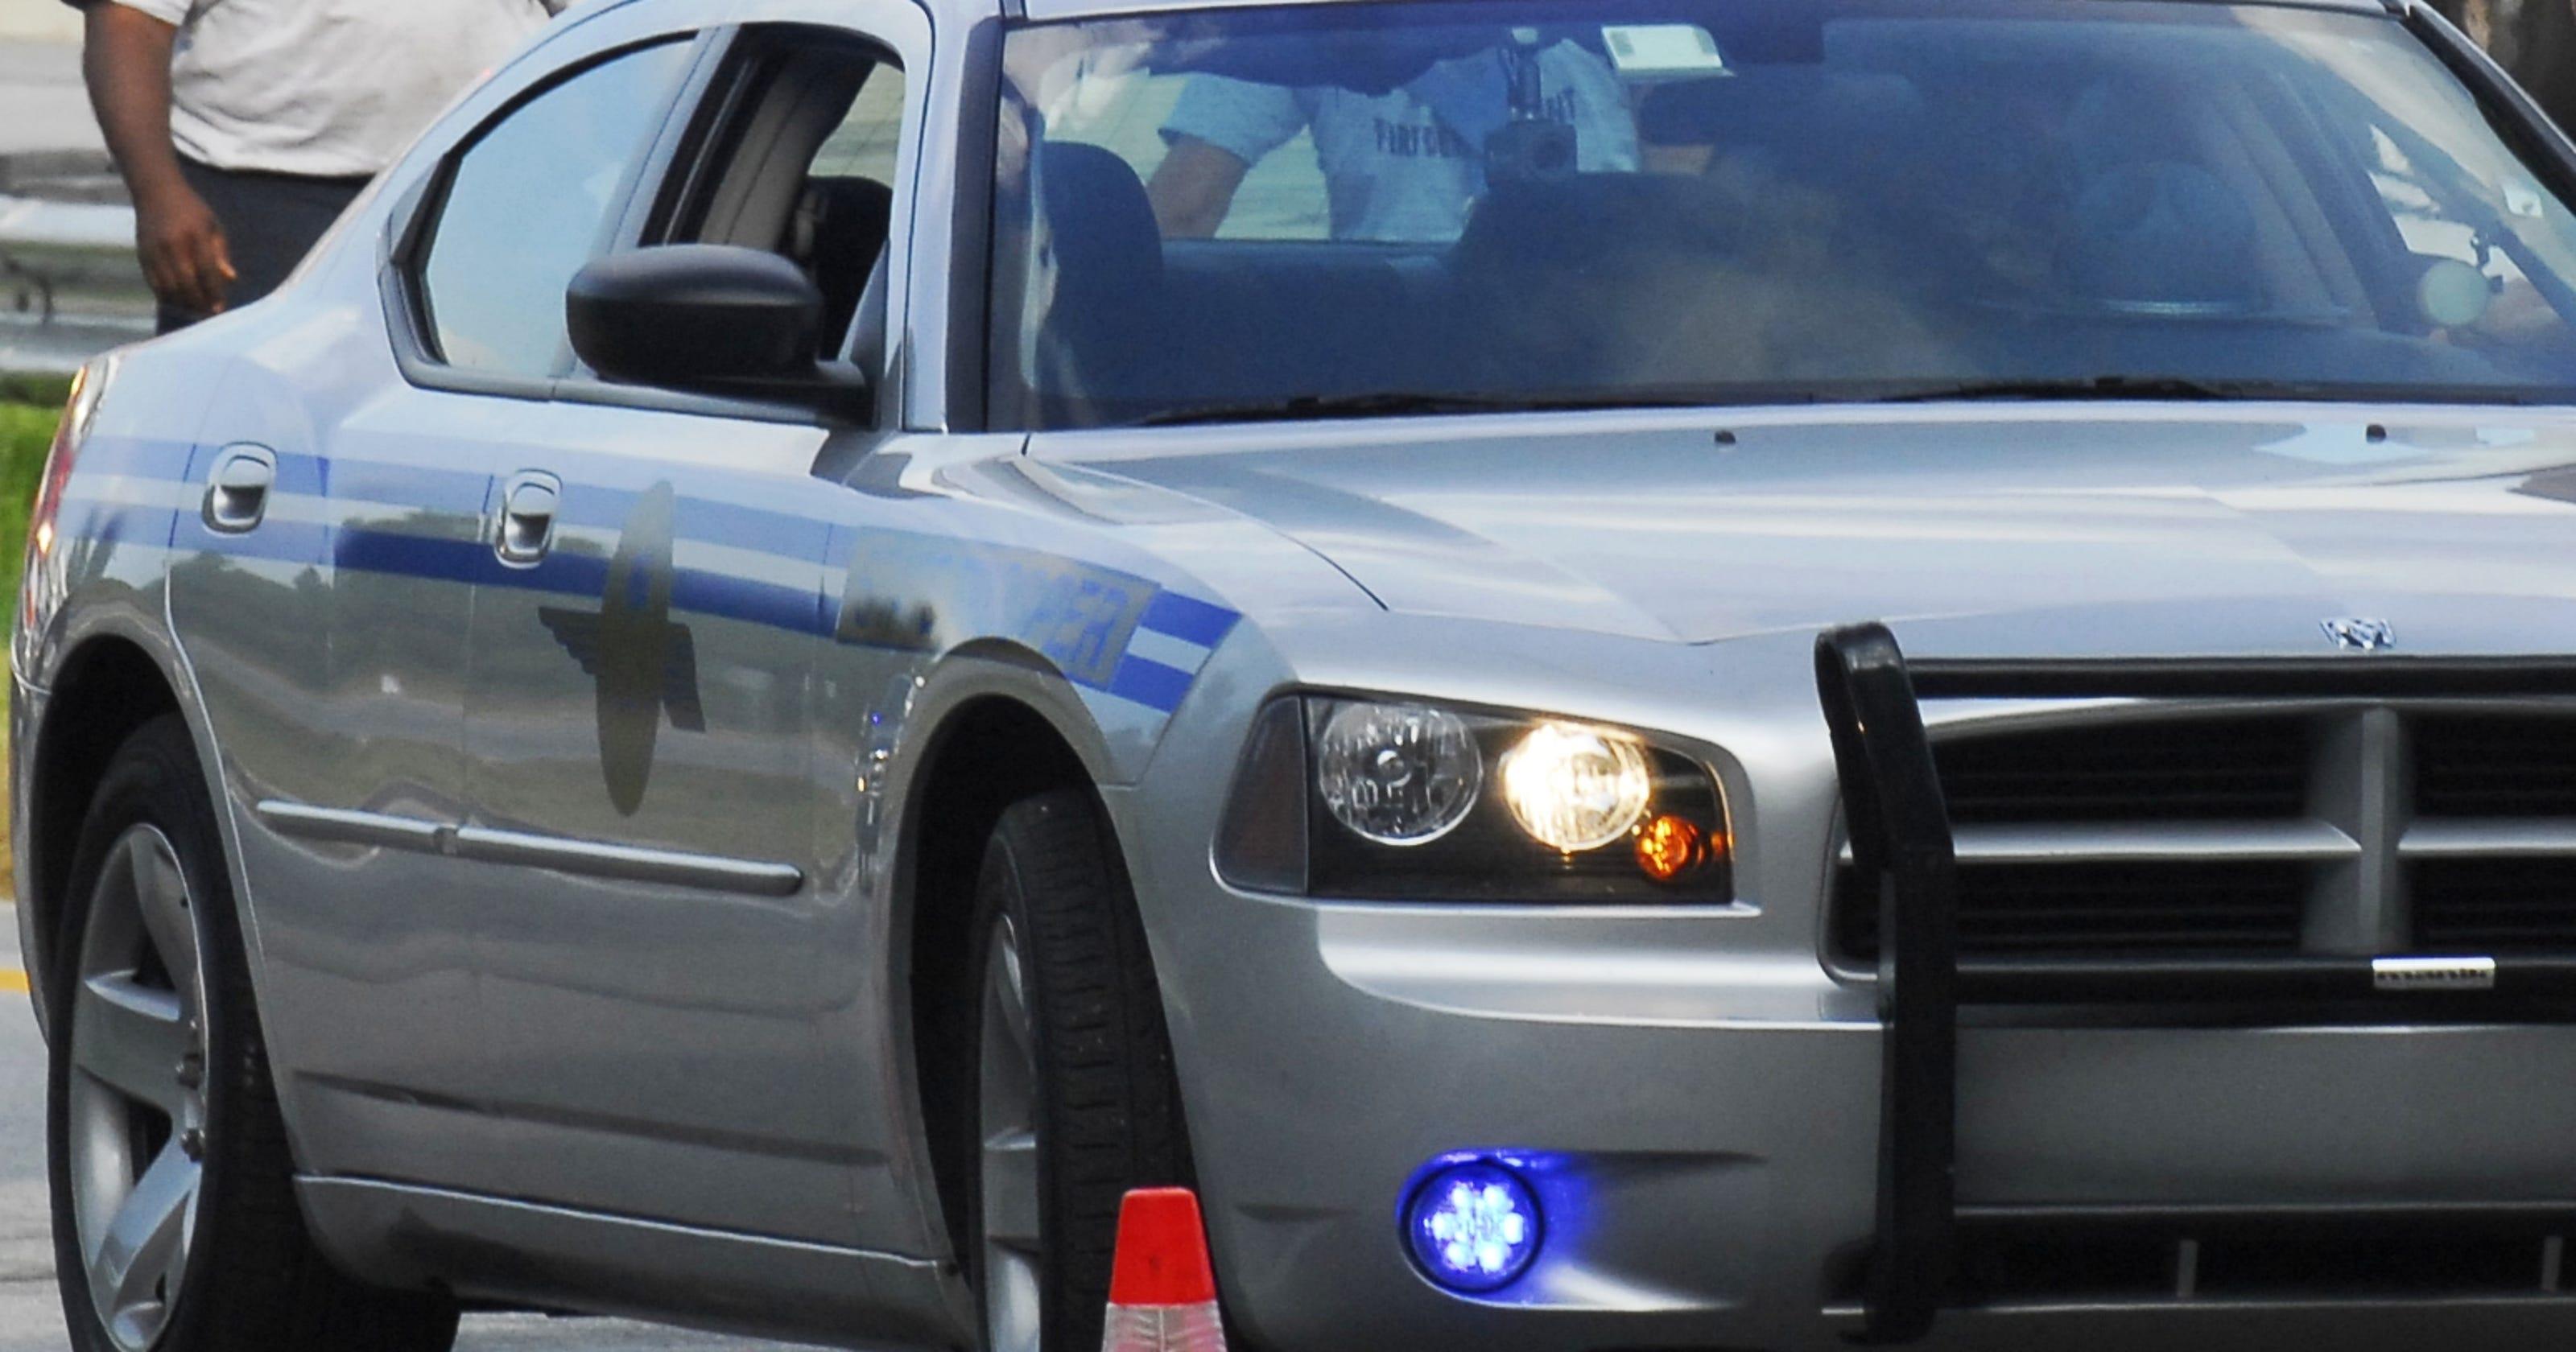 Greenville teen dies hours after being struck by vehicle in Oconee Co